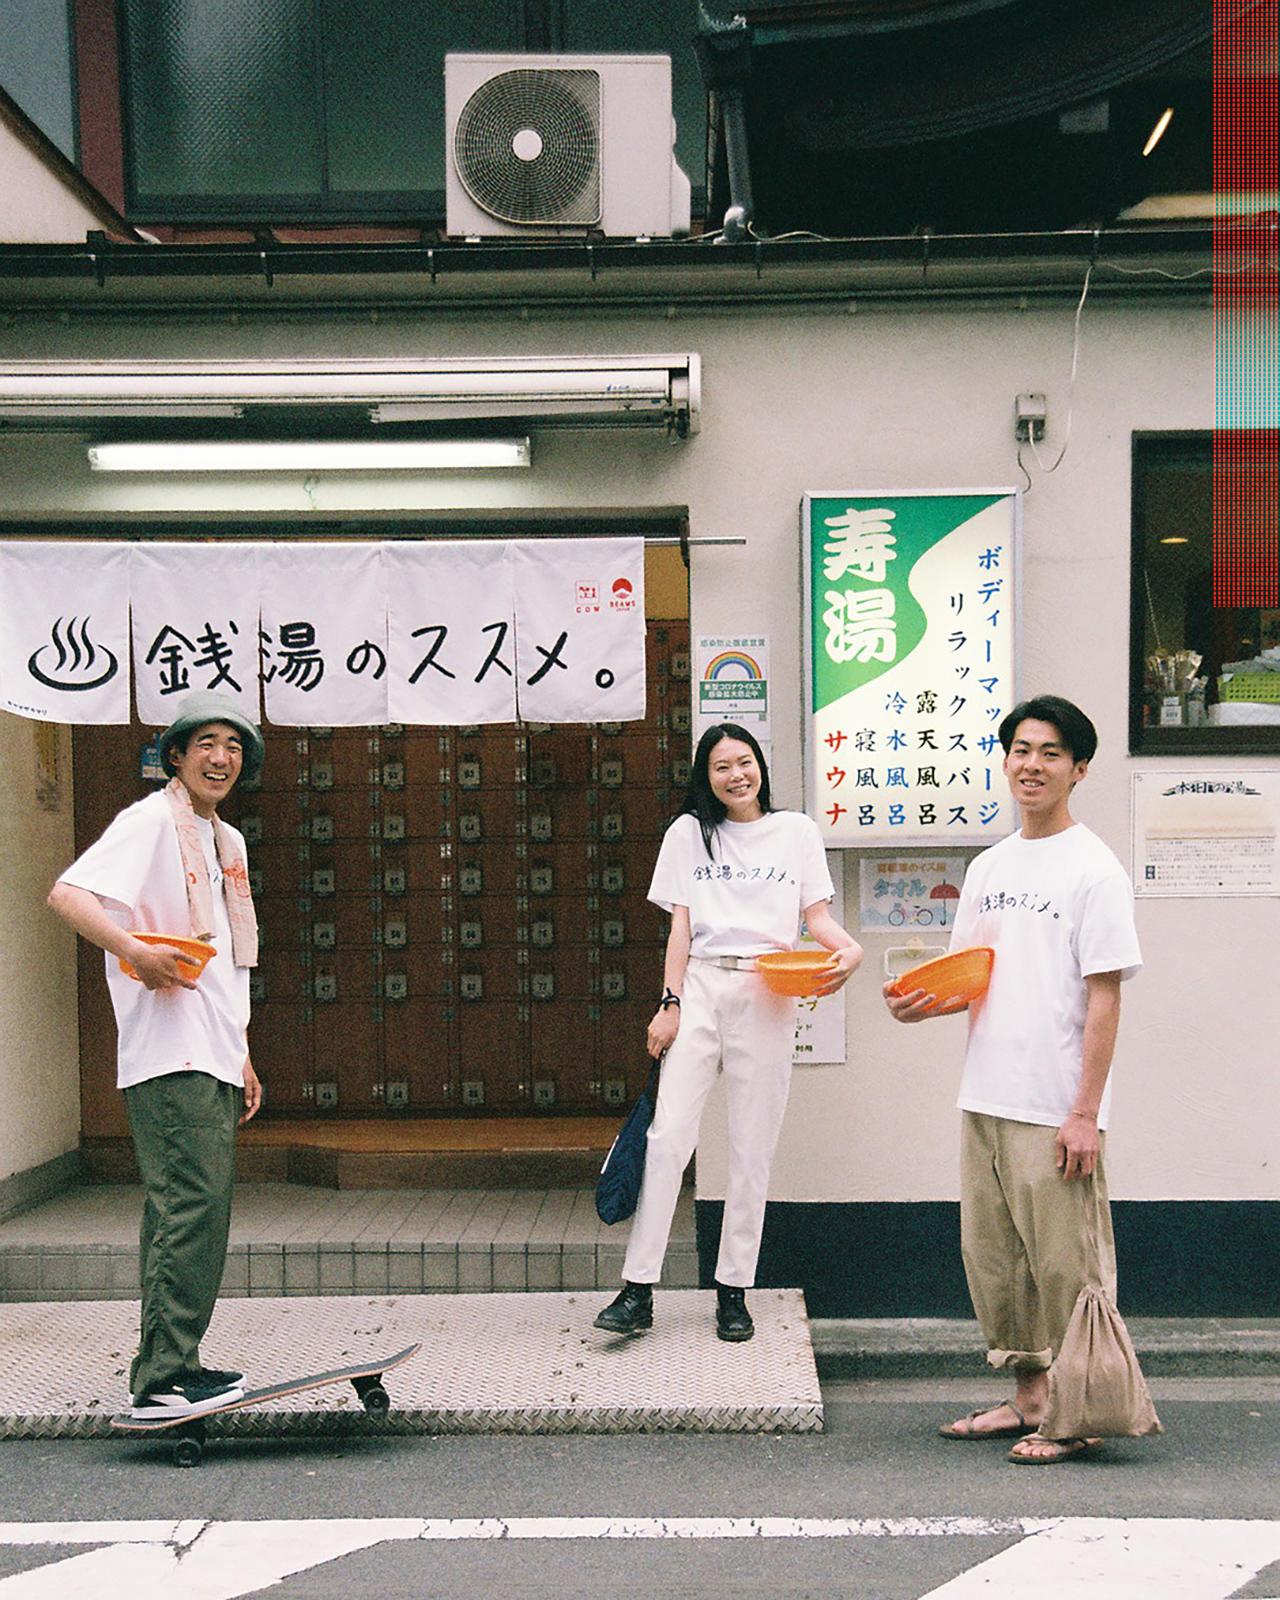 BEAMS JAPAN x COW SOAP x Mari Yamazaki ร่วมแปลงโฉมเซนโต Kotobukiyu ในโตเกียว